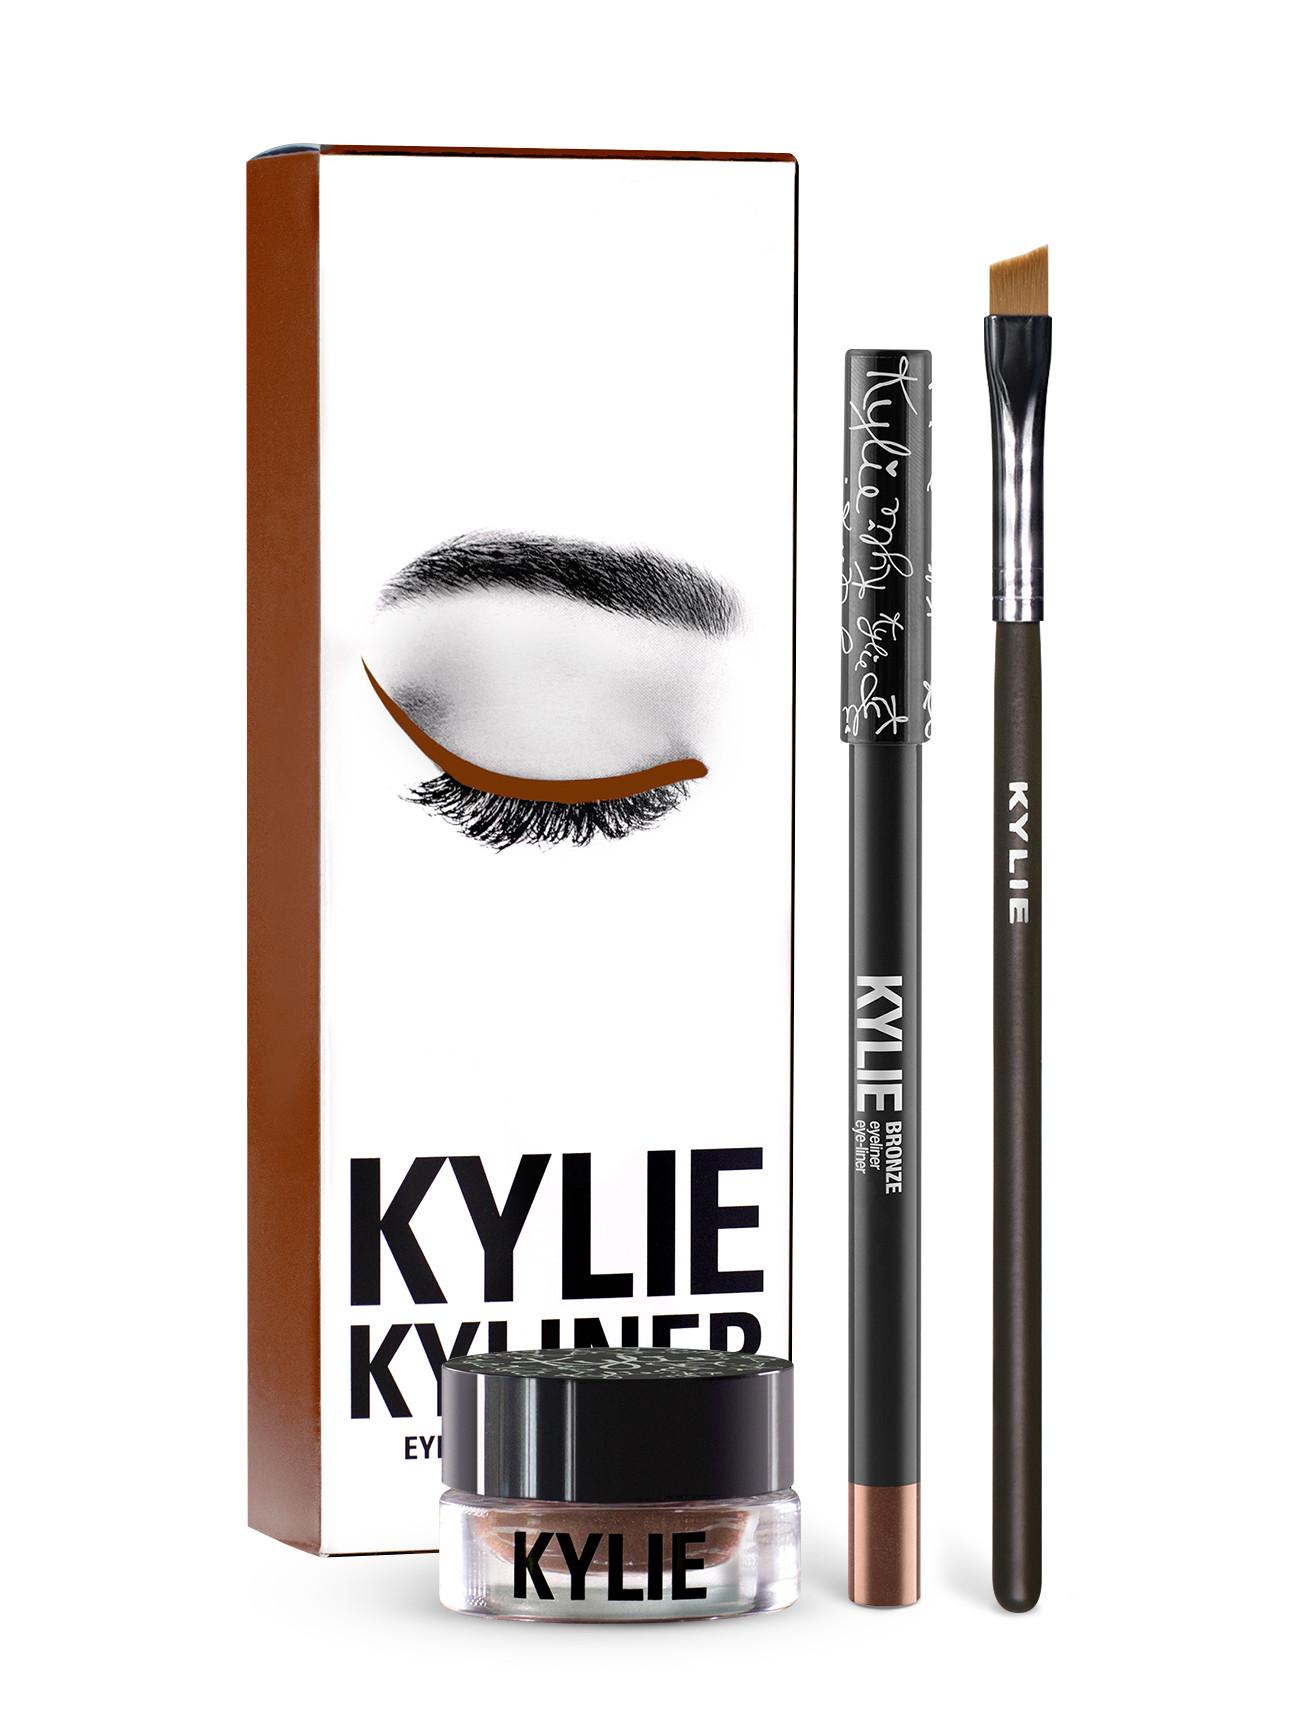 Kylie Cosmetics Bronze Kyliner Kit